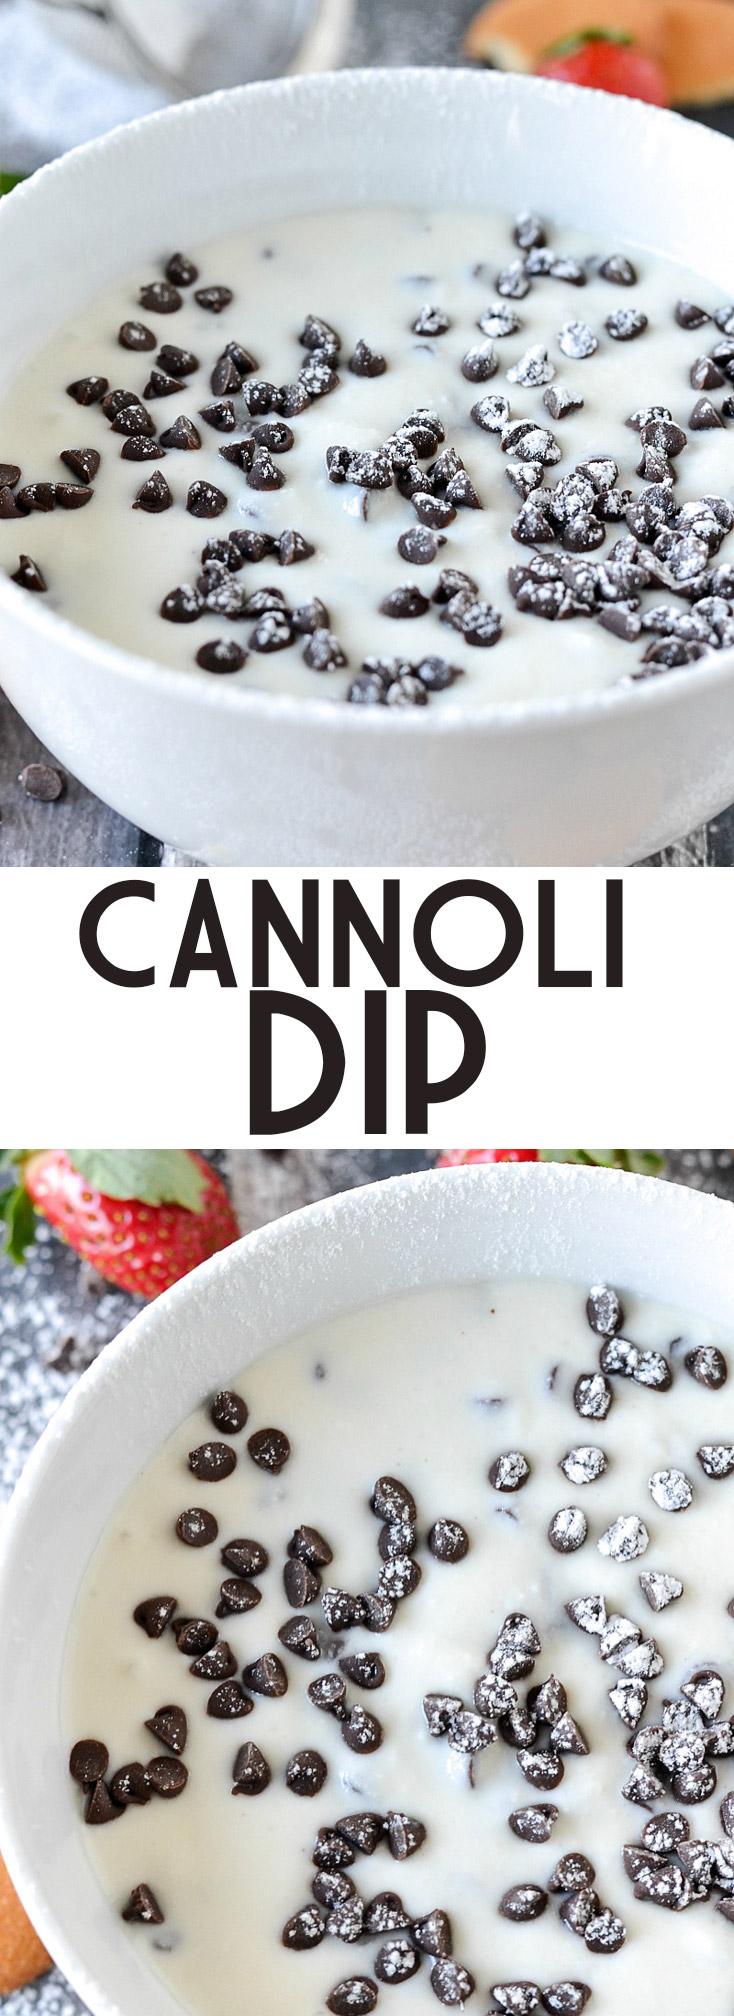 Cannoli Dip | www.motherthyme.com